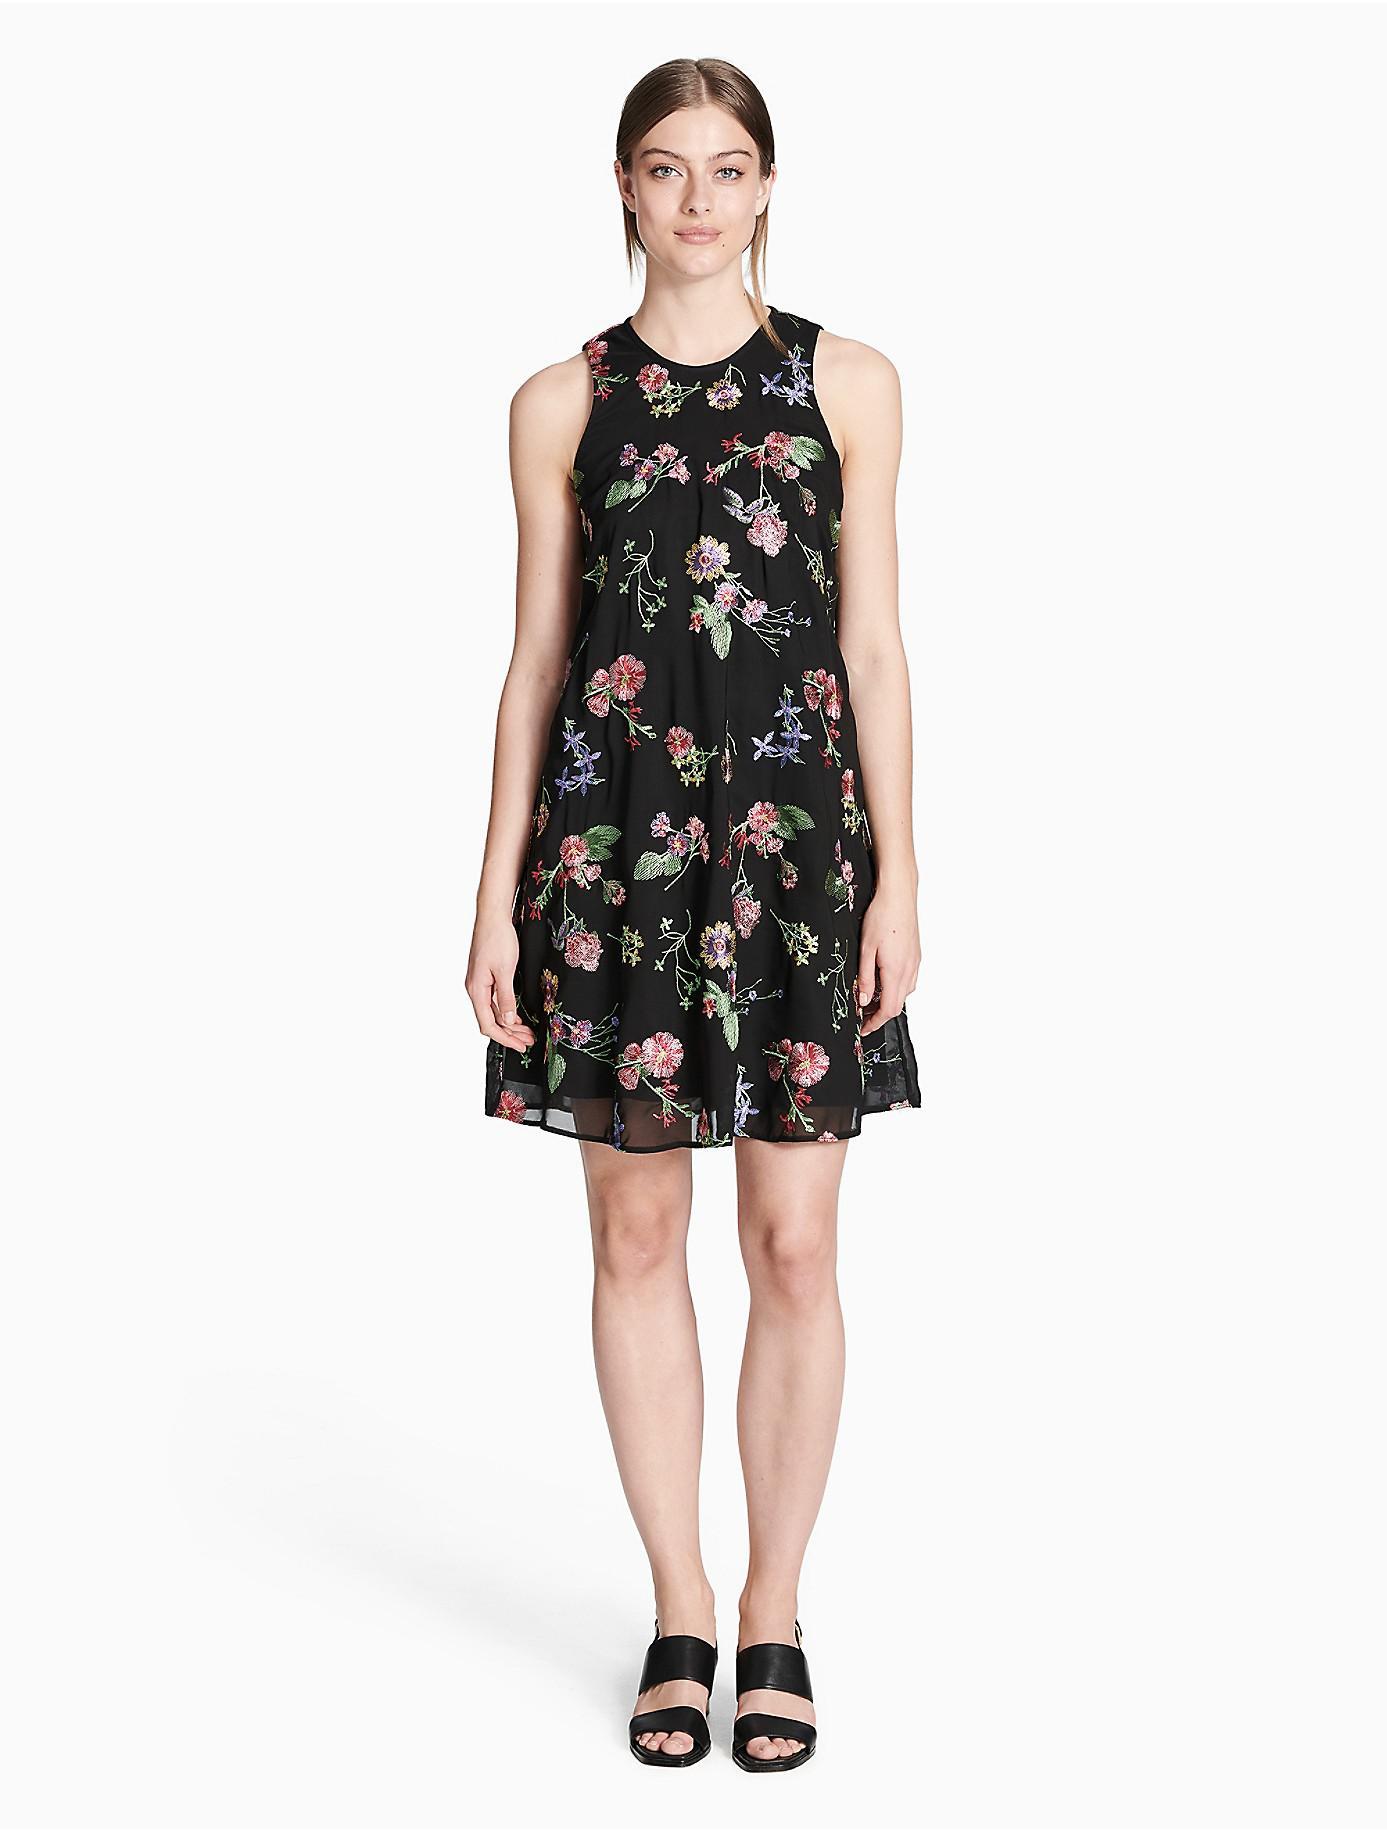 floral embroidered shift dress - Black CALVIN KLEIN 205W39NYC 6zItG1